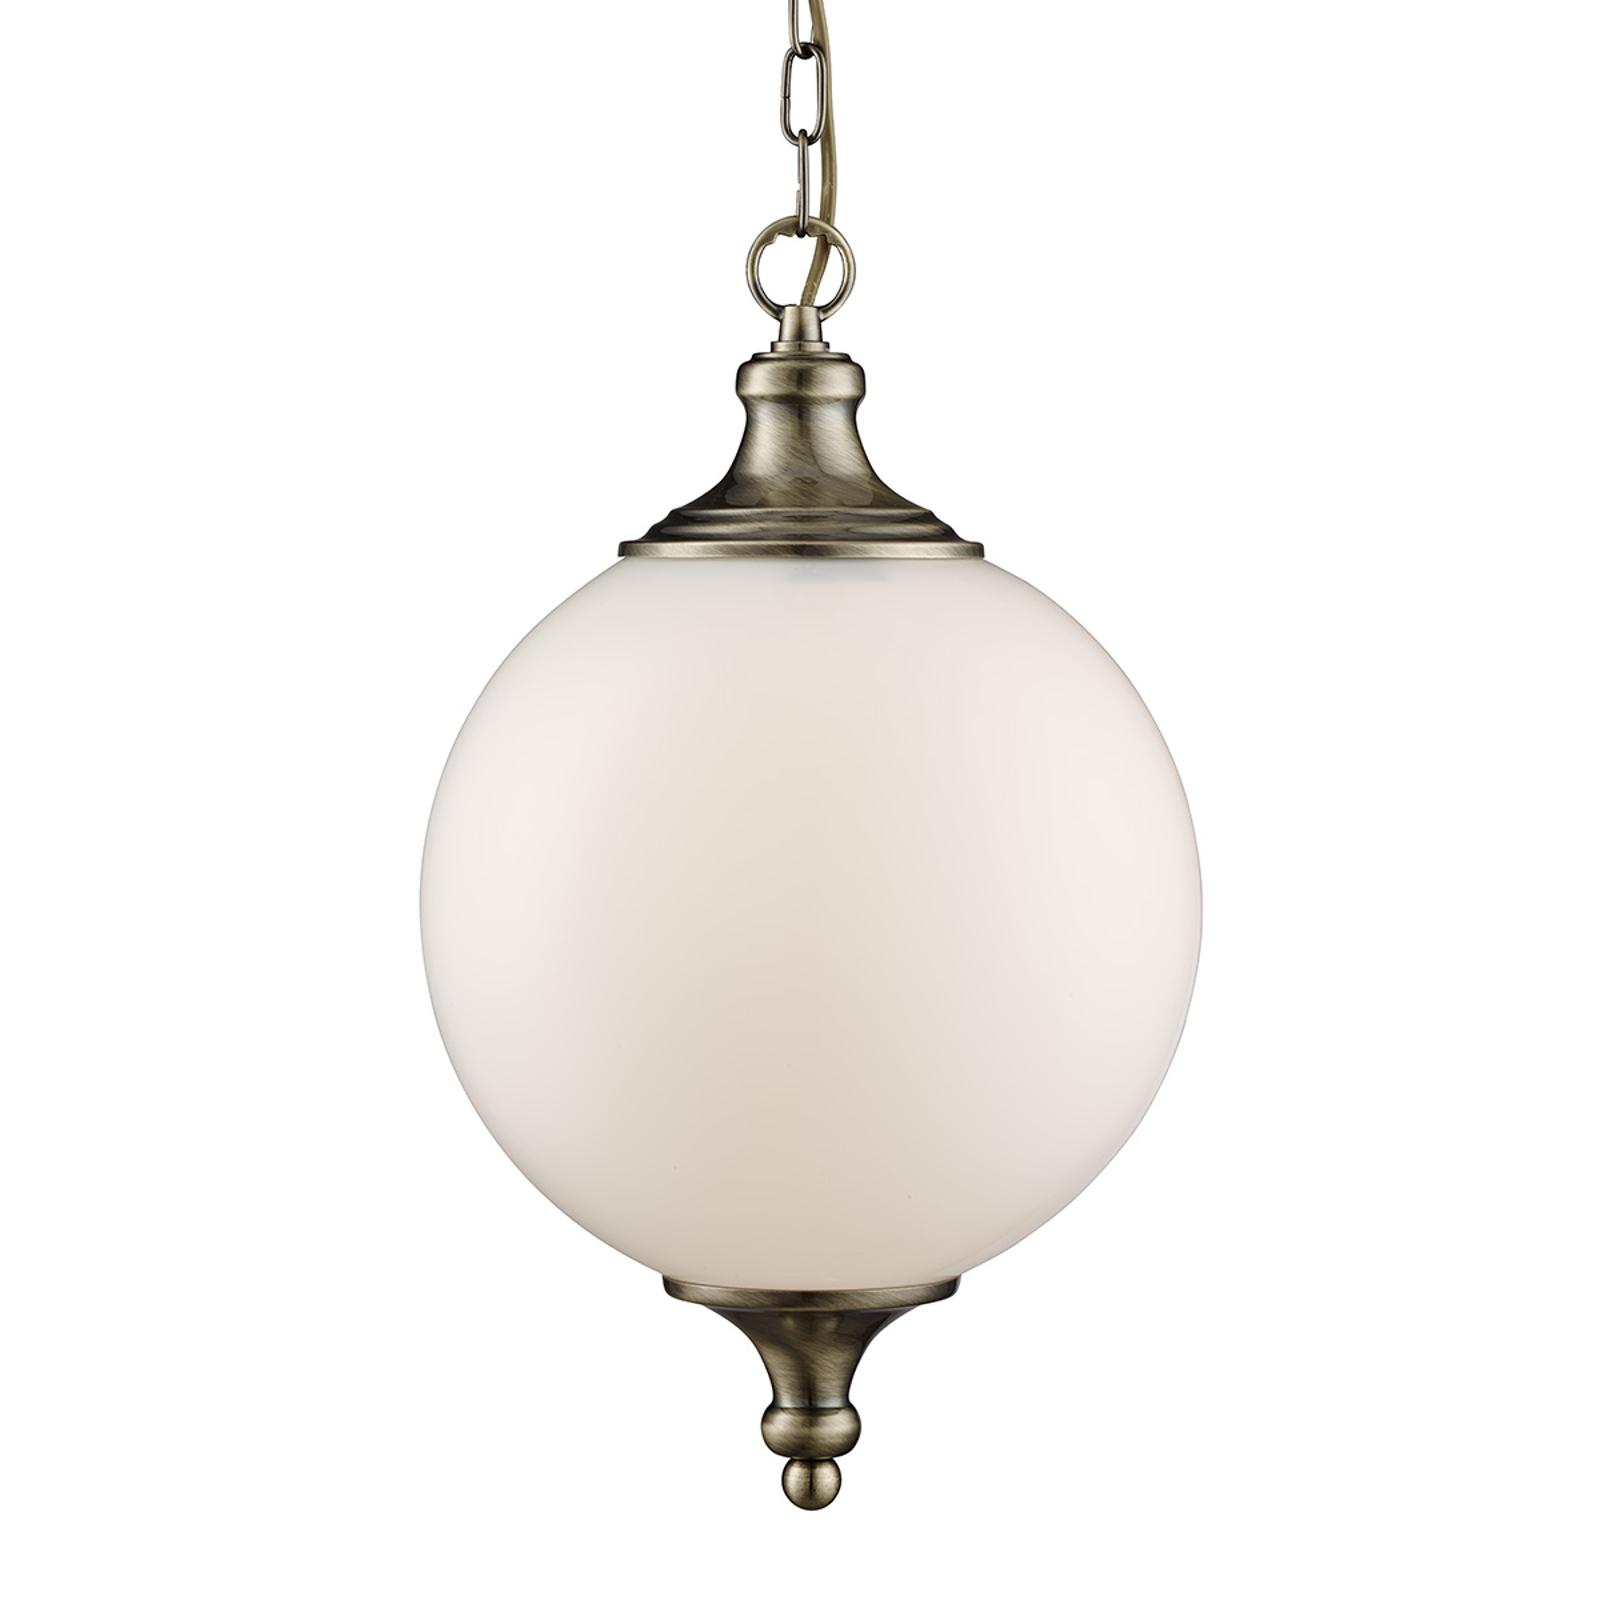 Acquista Lampada sosp vetro sferica Whisko ottone antico